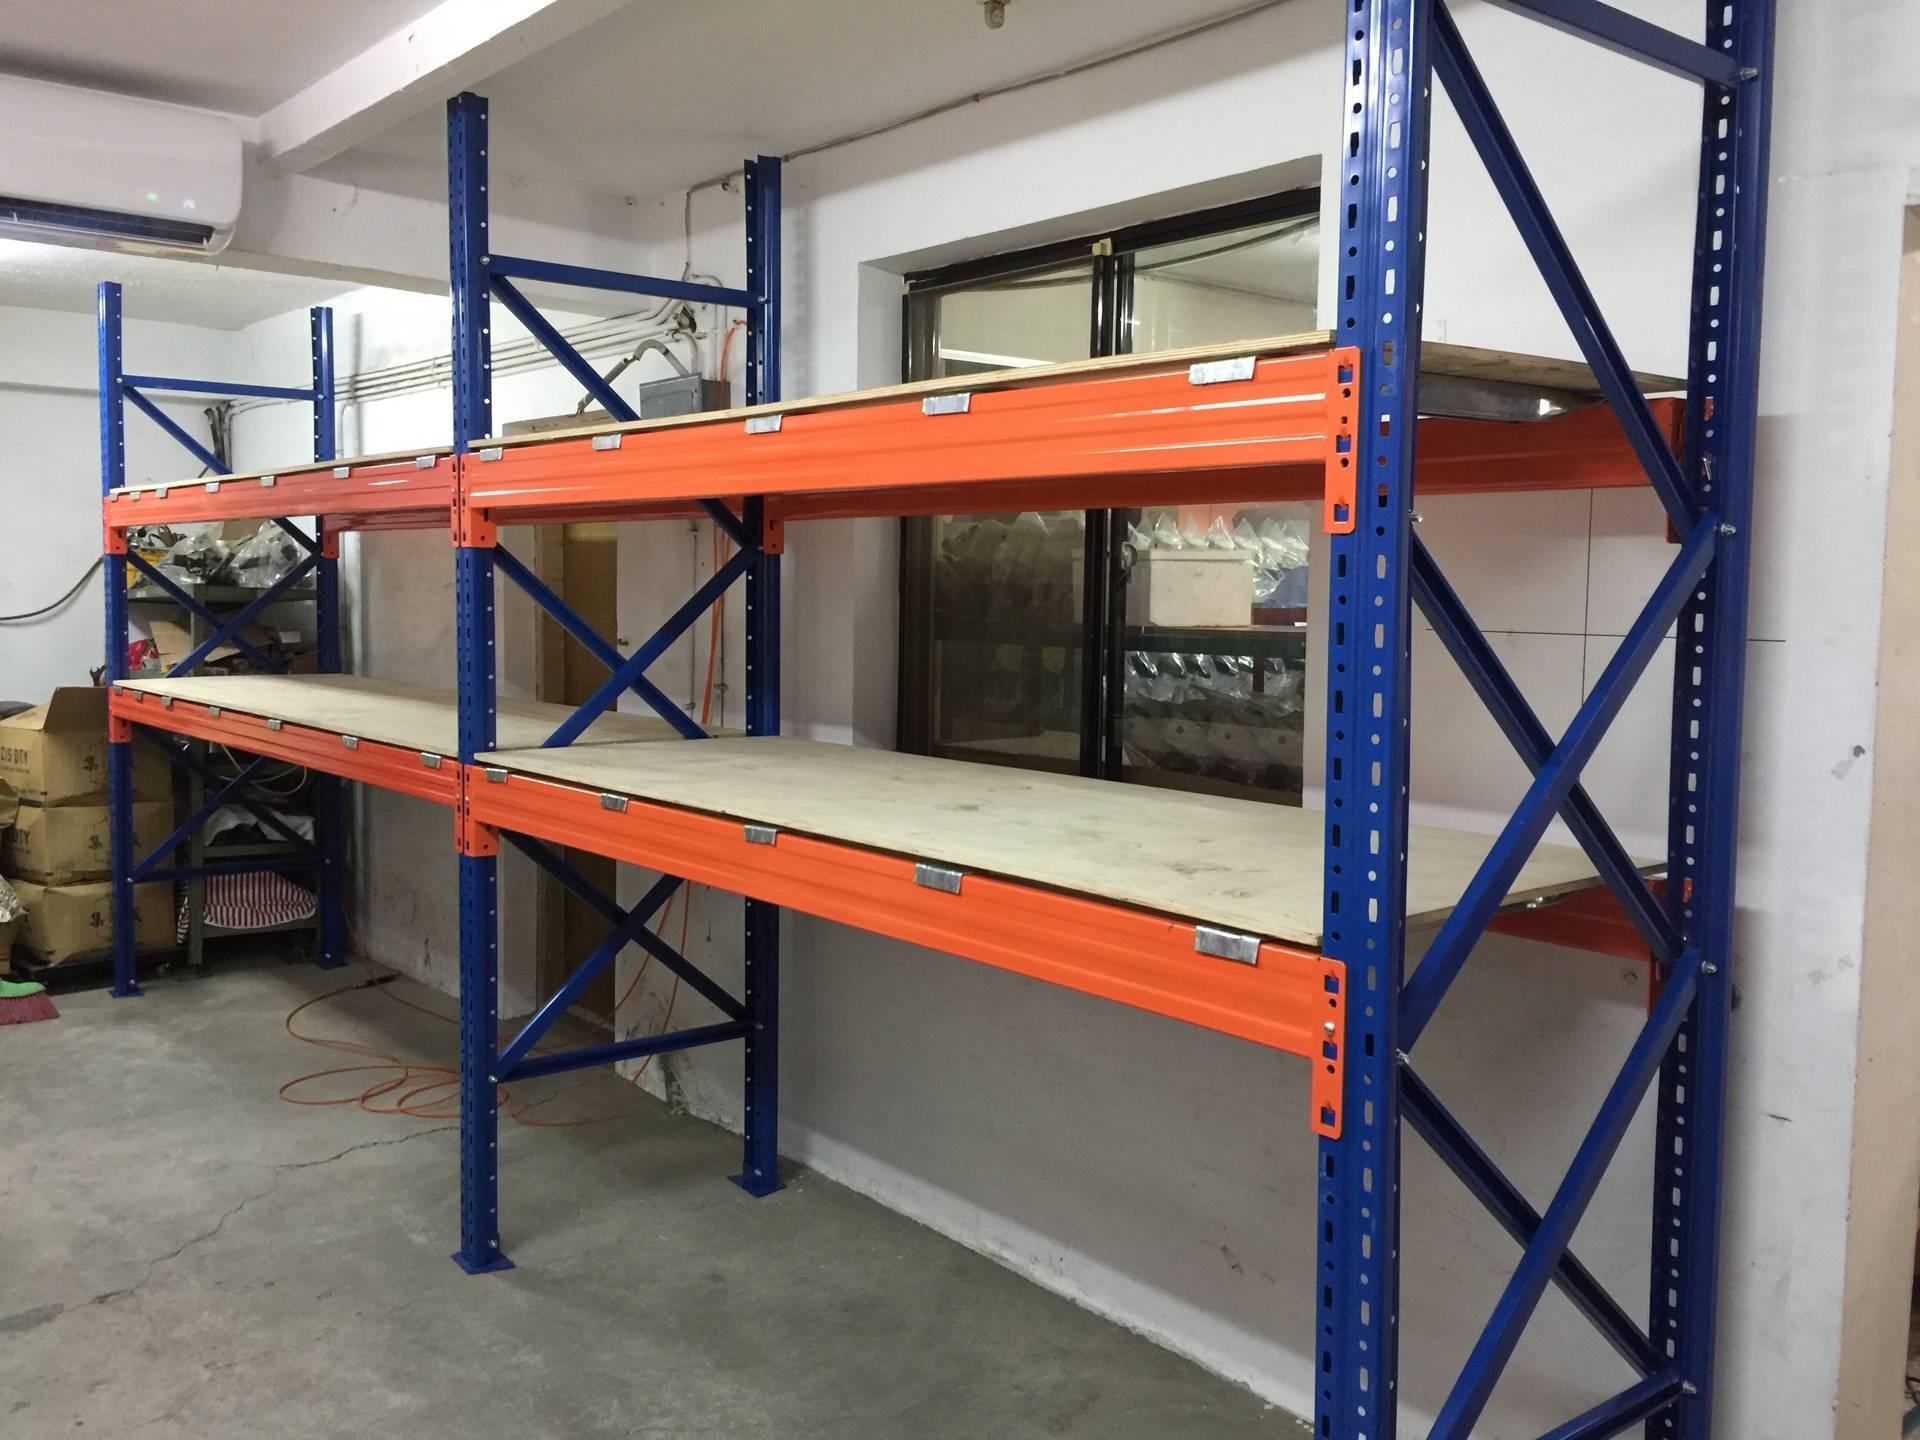 《B1W4》重型架:一般儲存/鋪木板